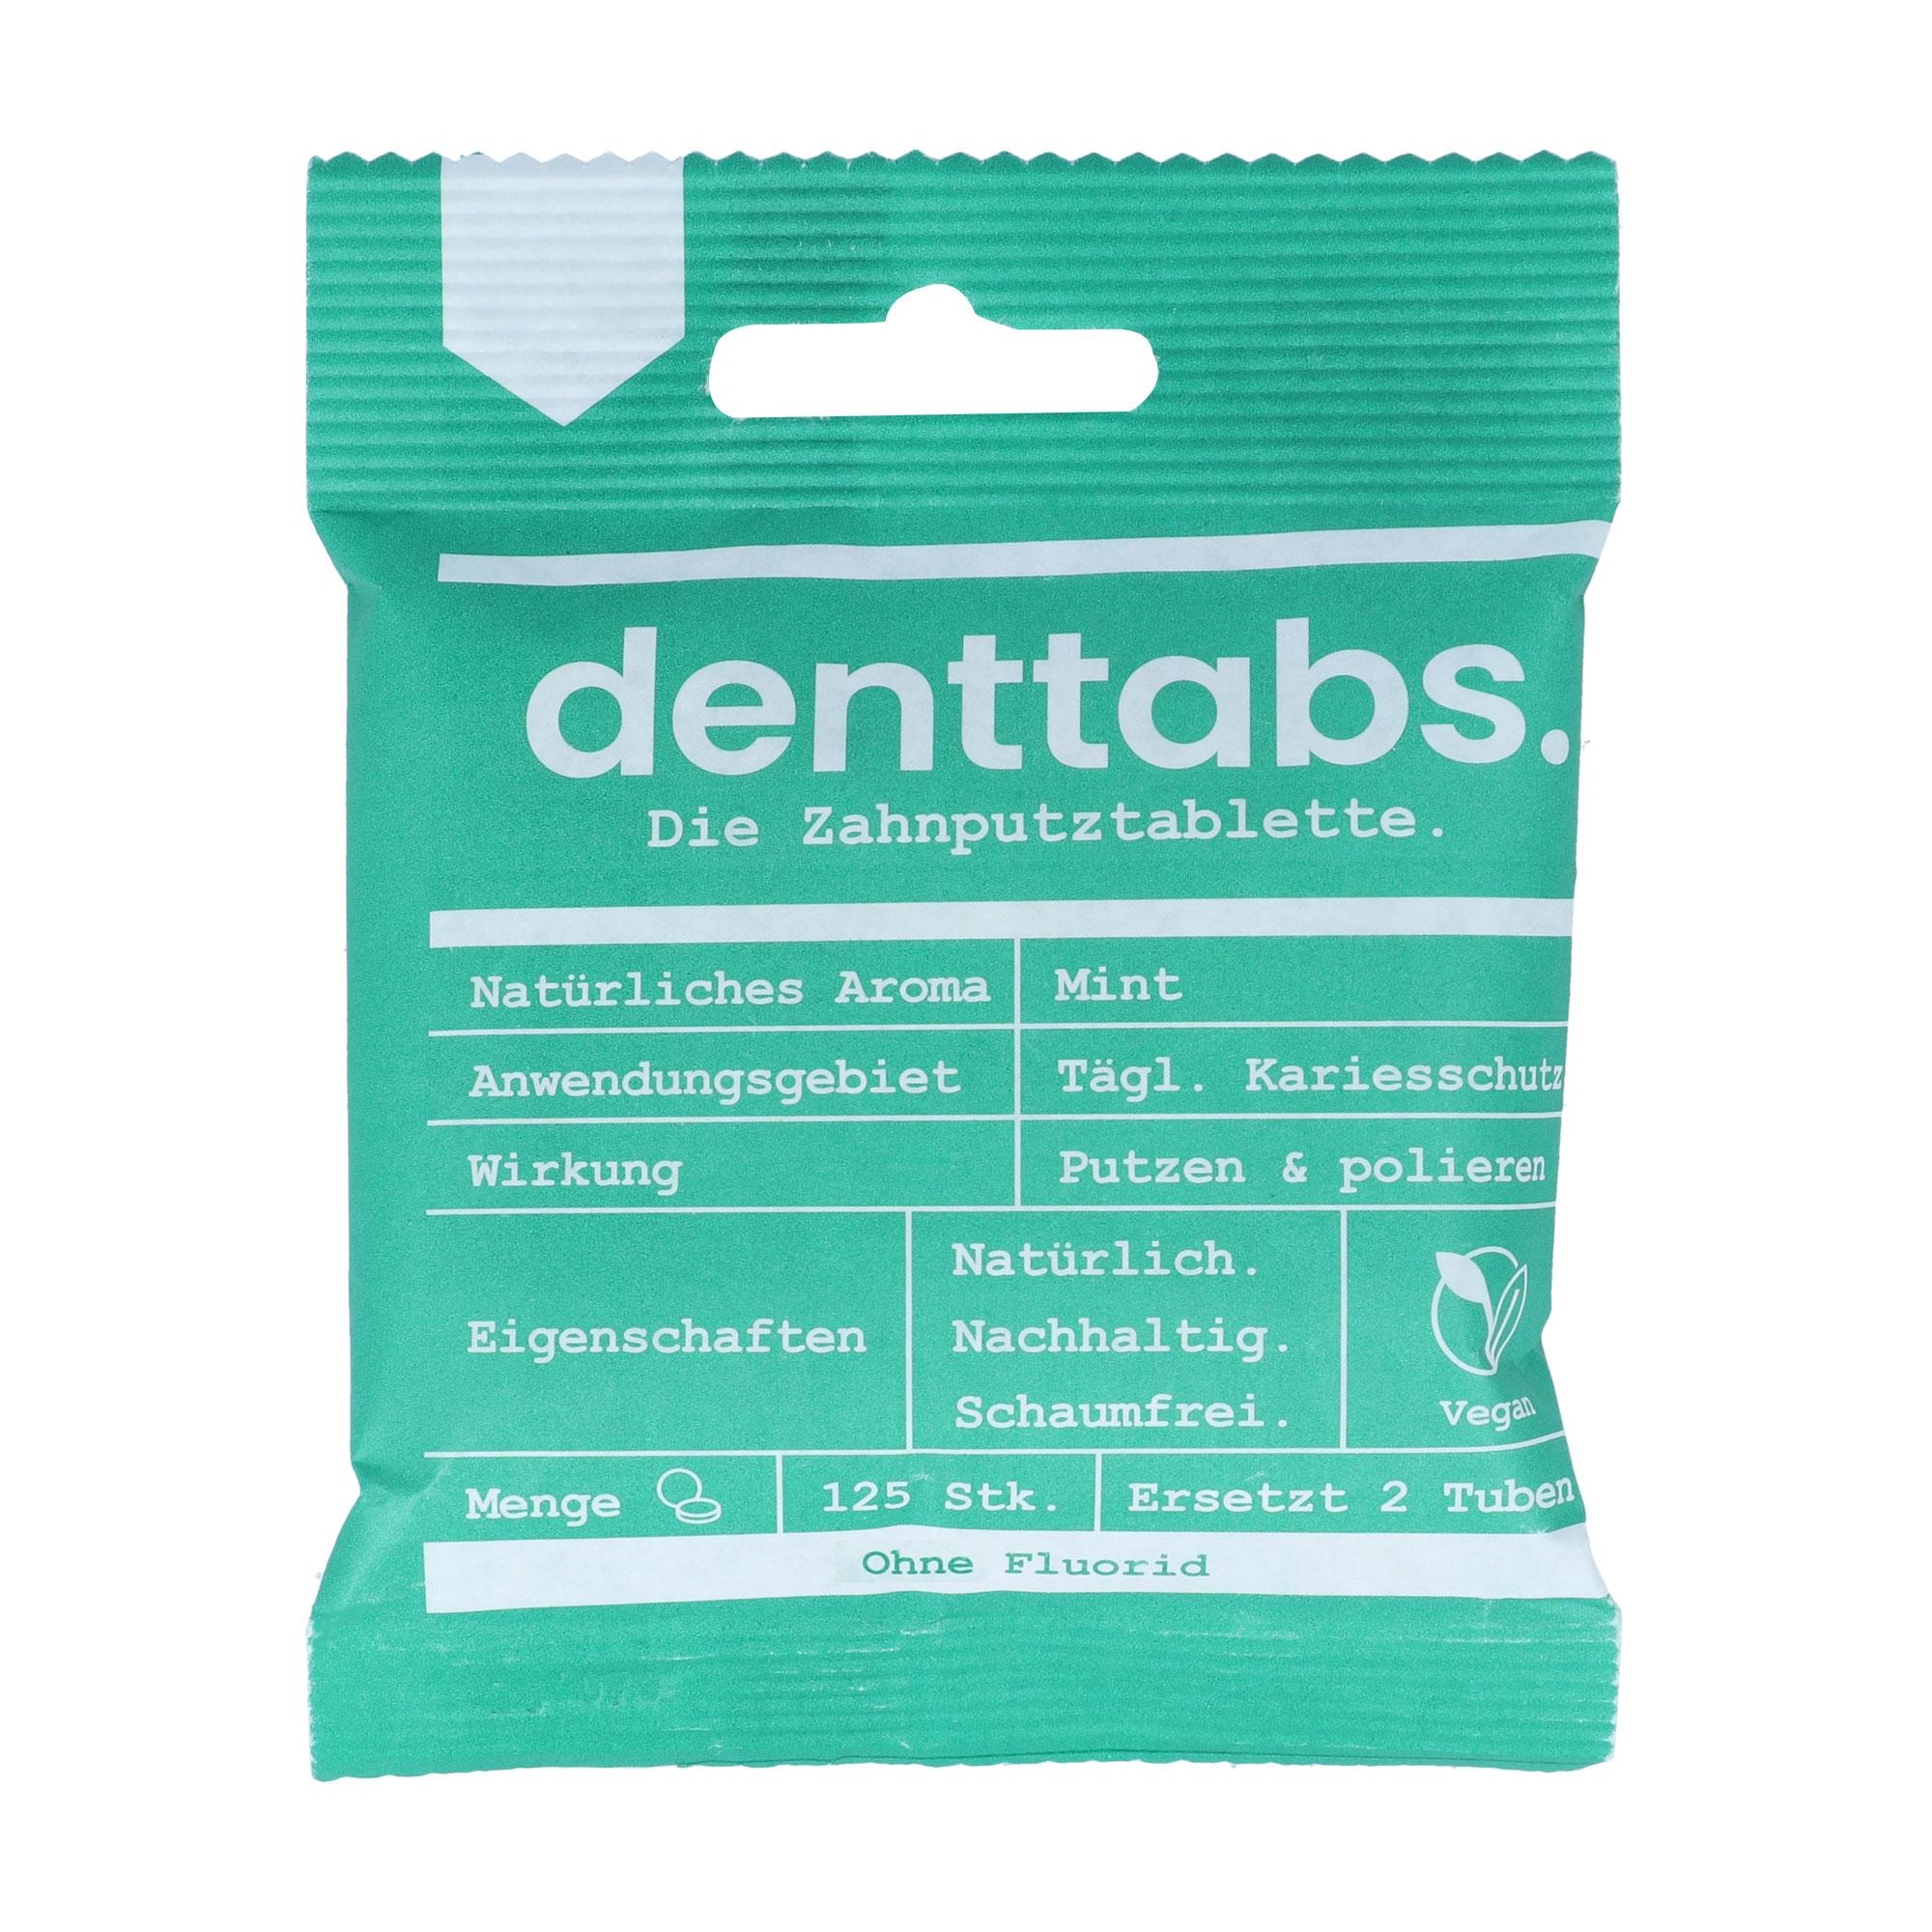 Denttabs Zahnputz-Tabletten Stevia-Mint flouridfrei